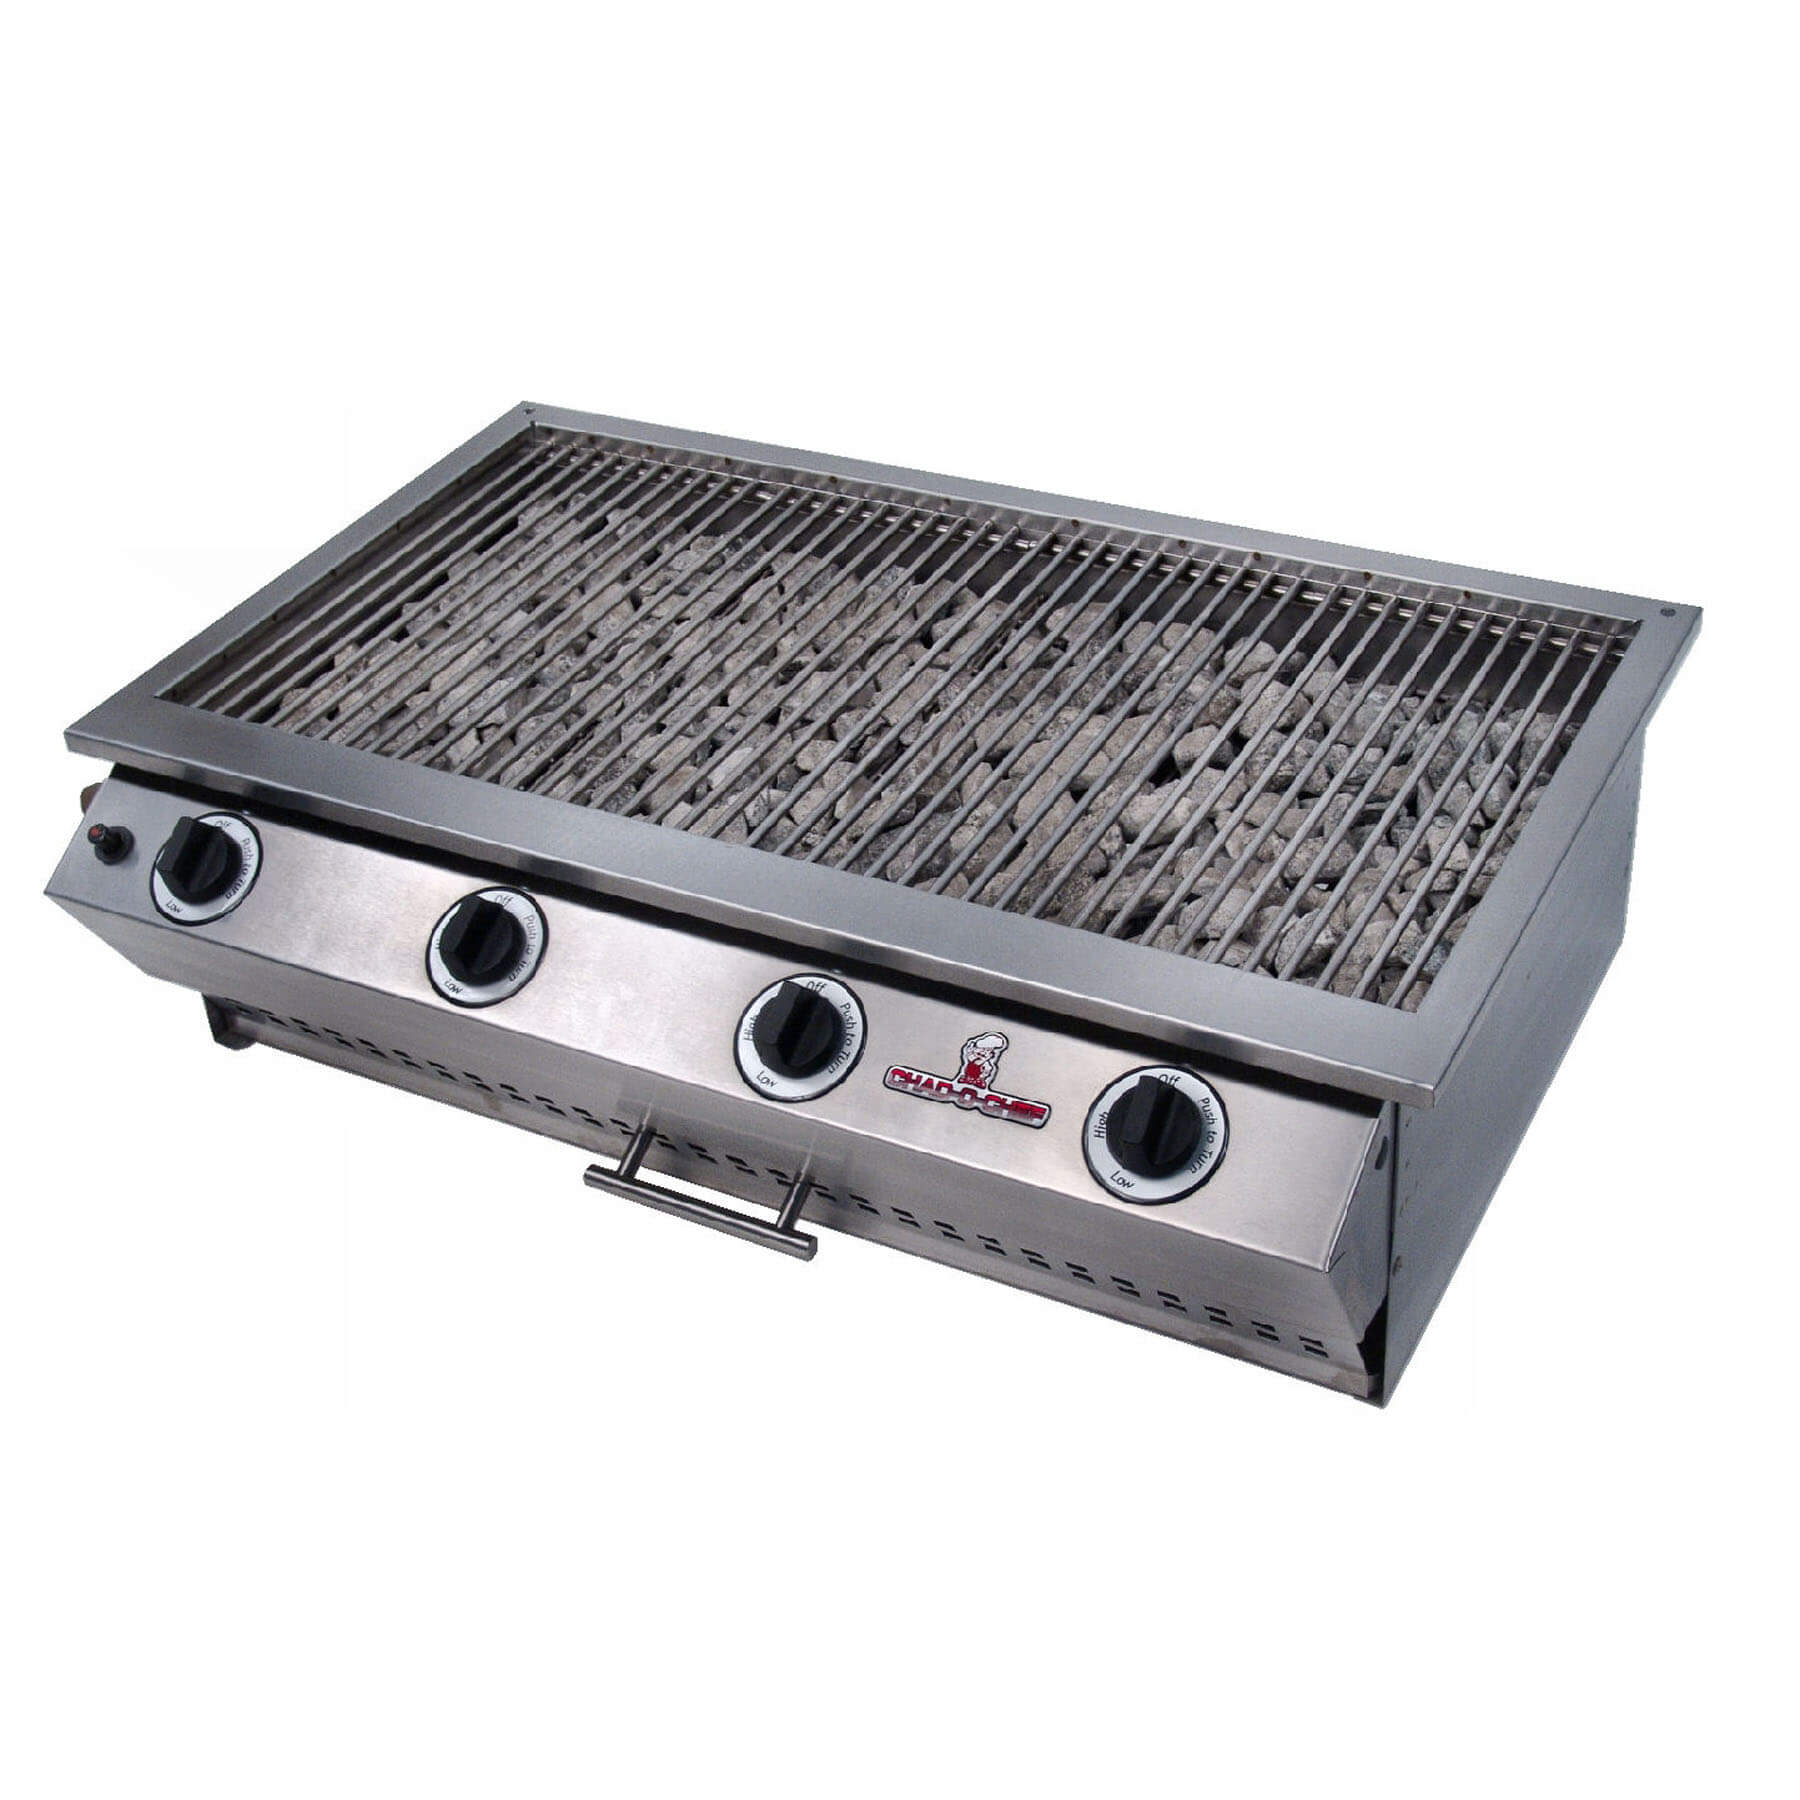 Braais-Gas-4-Burner-Sizzler-Gas-Grill